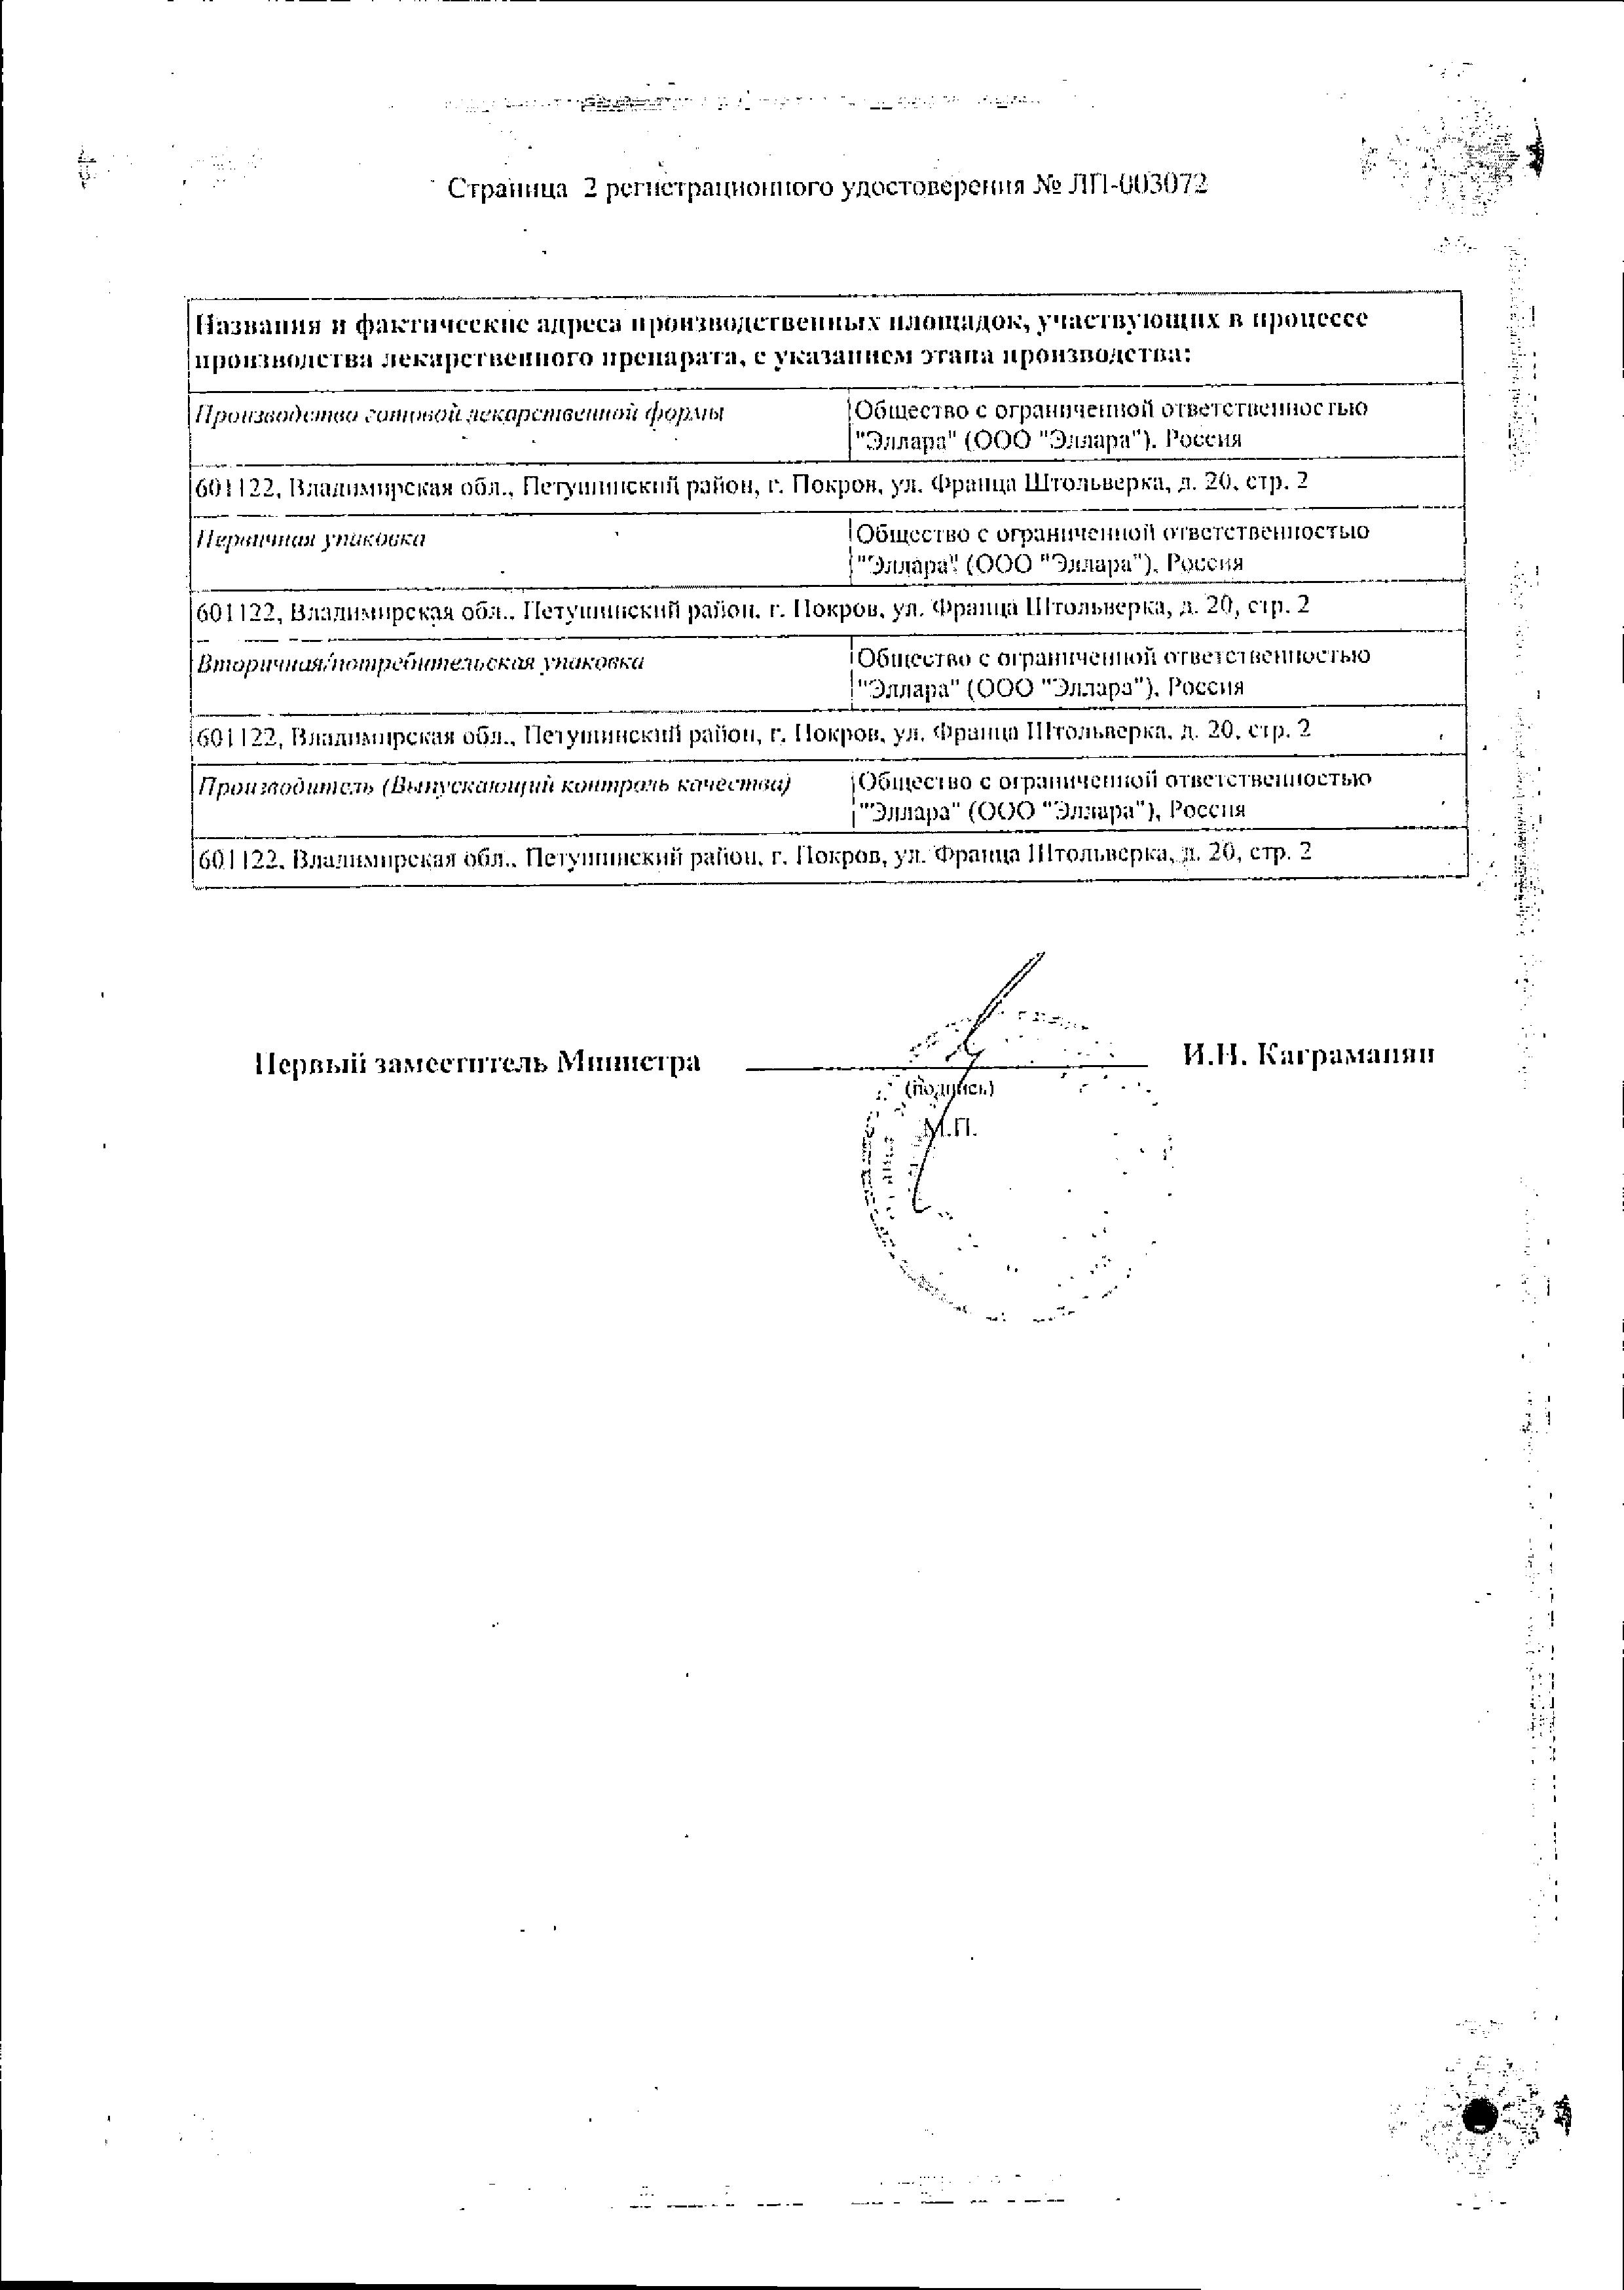 Метилэтилпиридинол сертификат